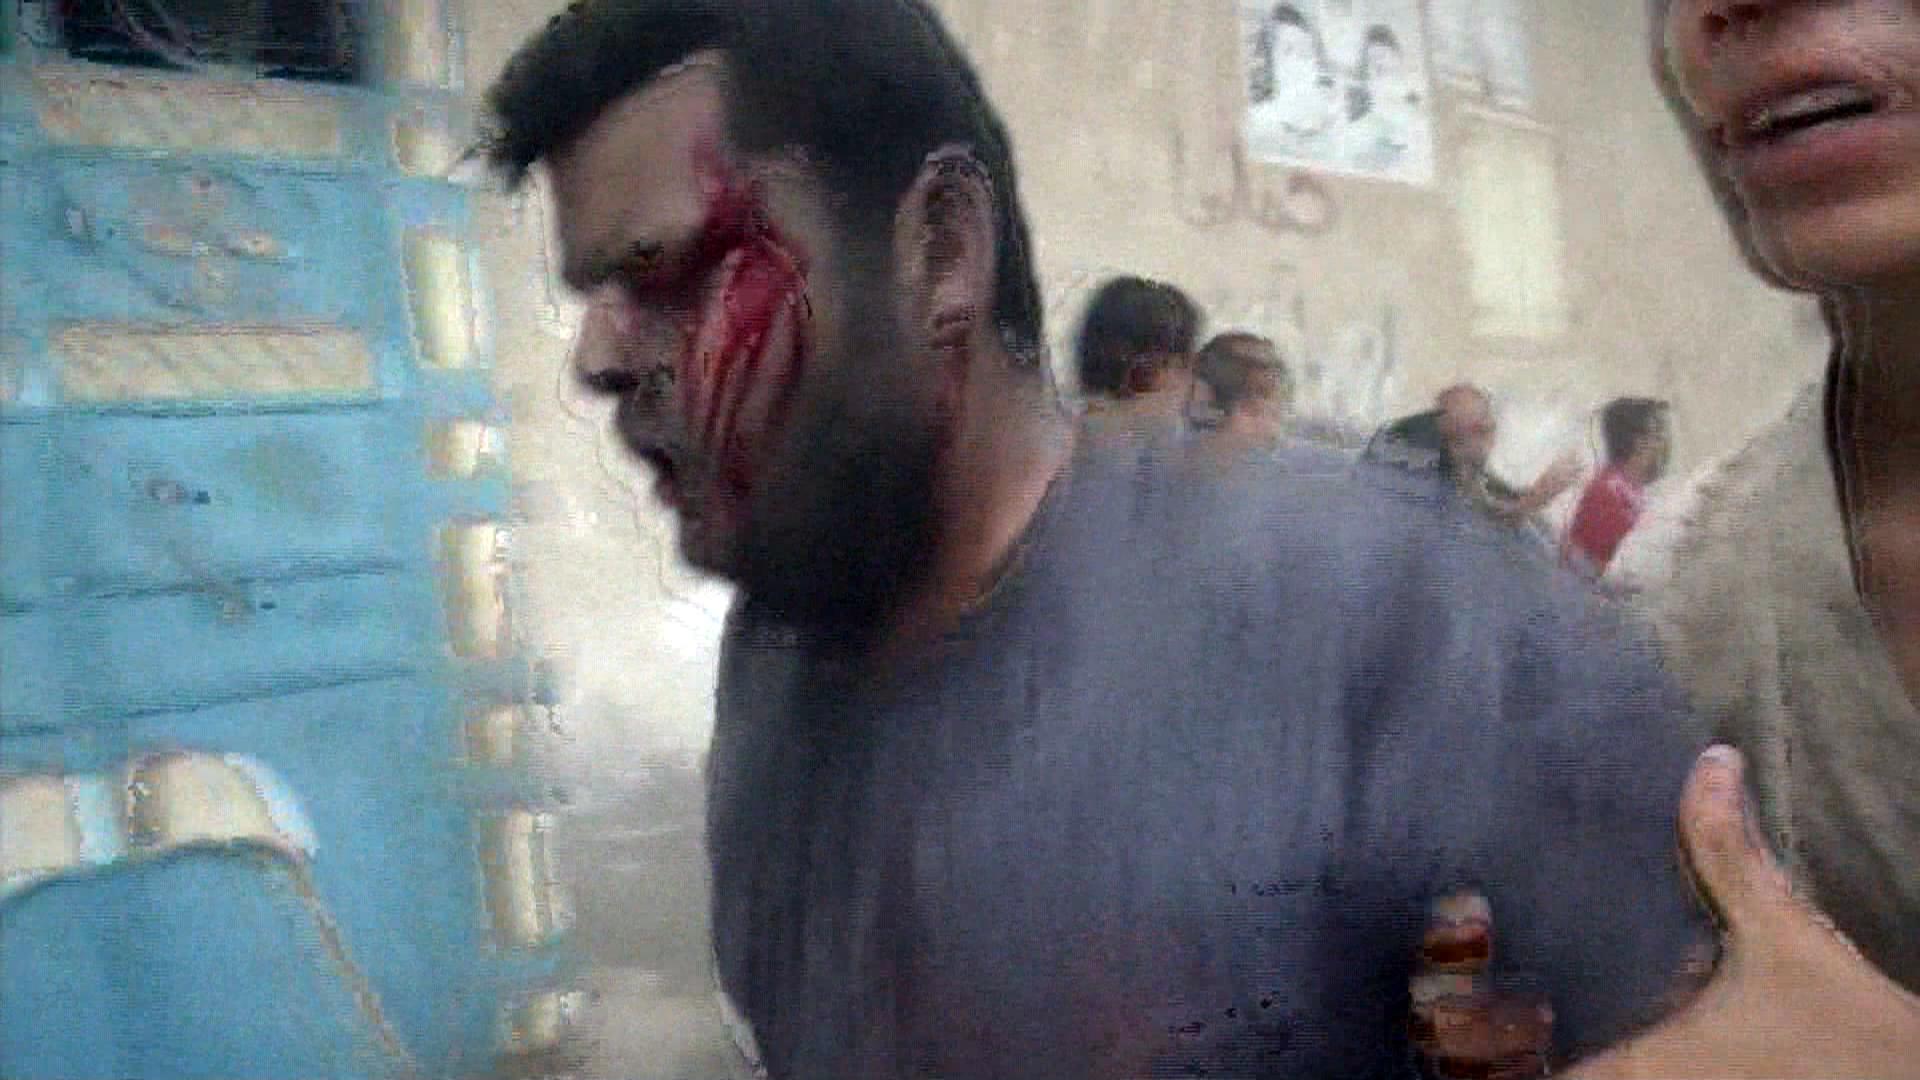 Israel Attacks 160 Gaza Sites as Anti-Hamas Offensive Kills 32